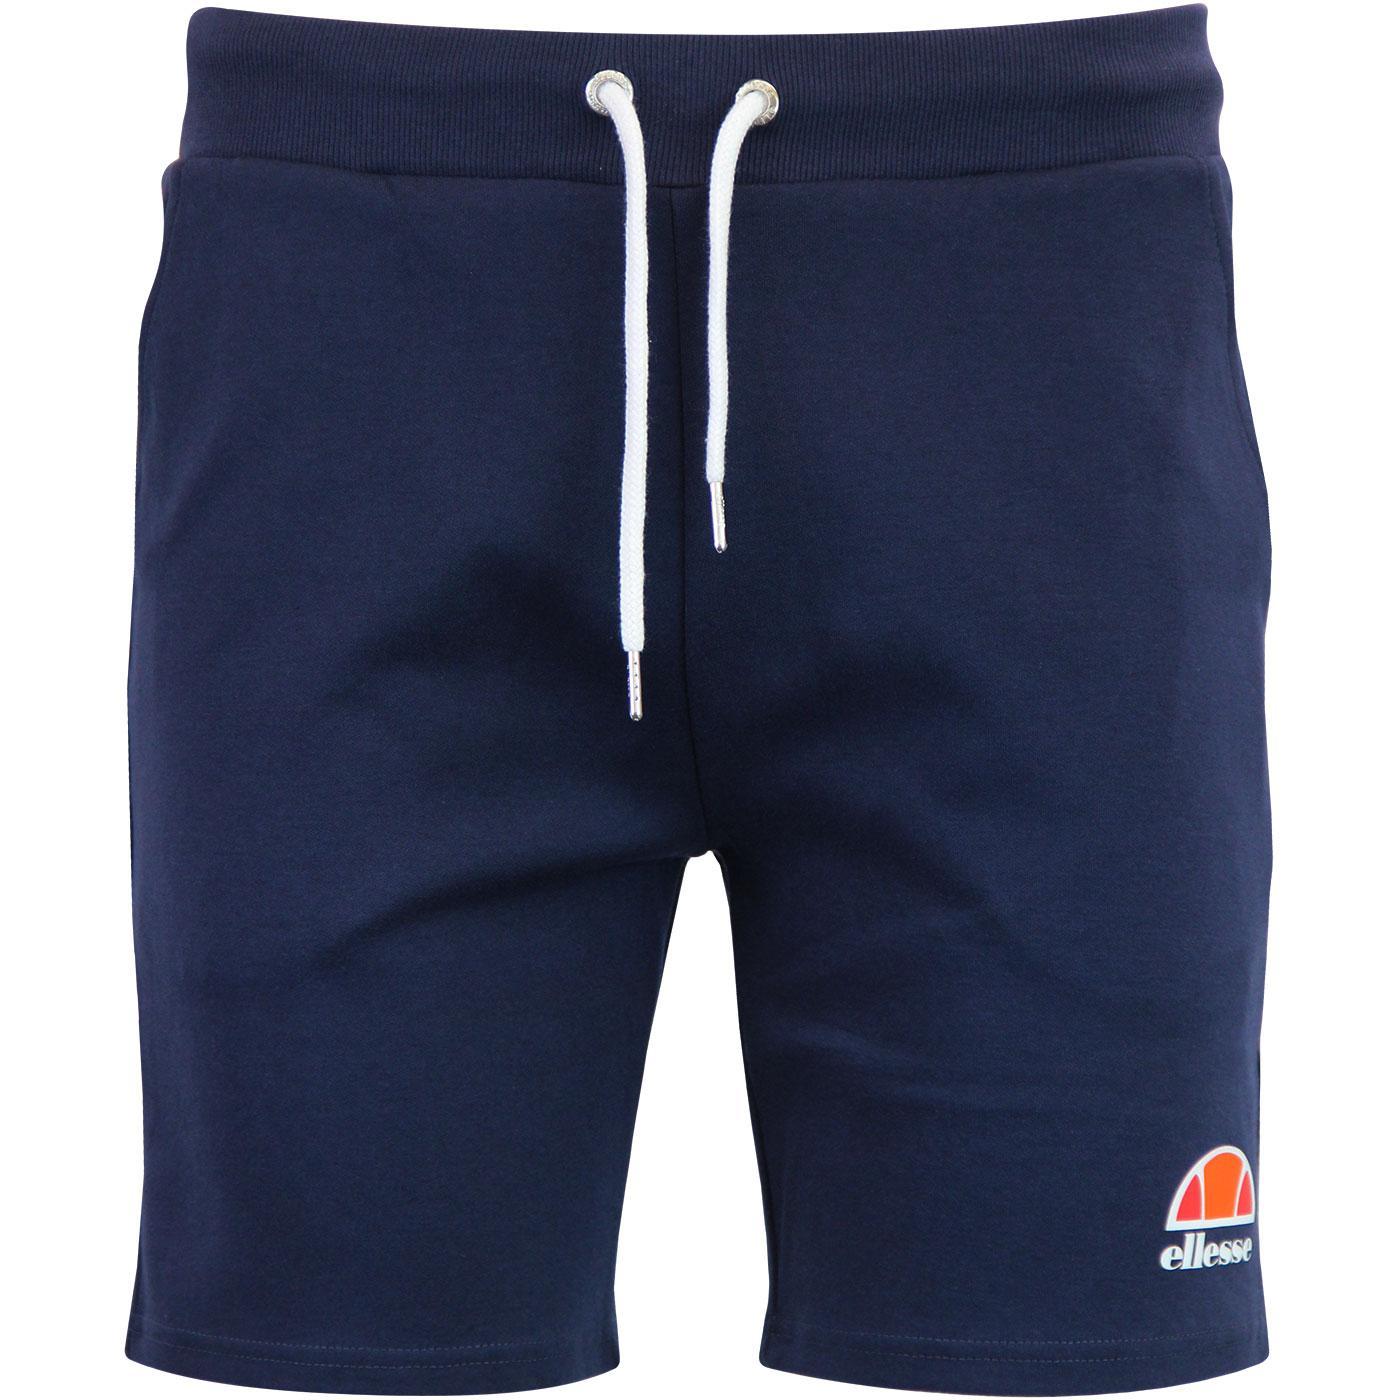 Crawford ELLESSE Retro Summer Sports Shorts NAVY